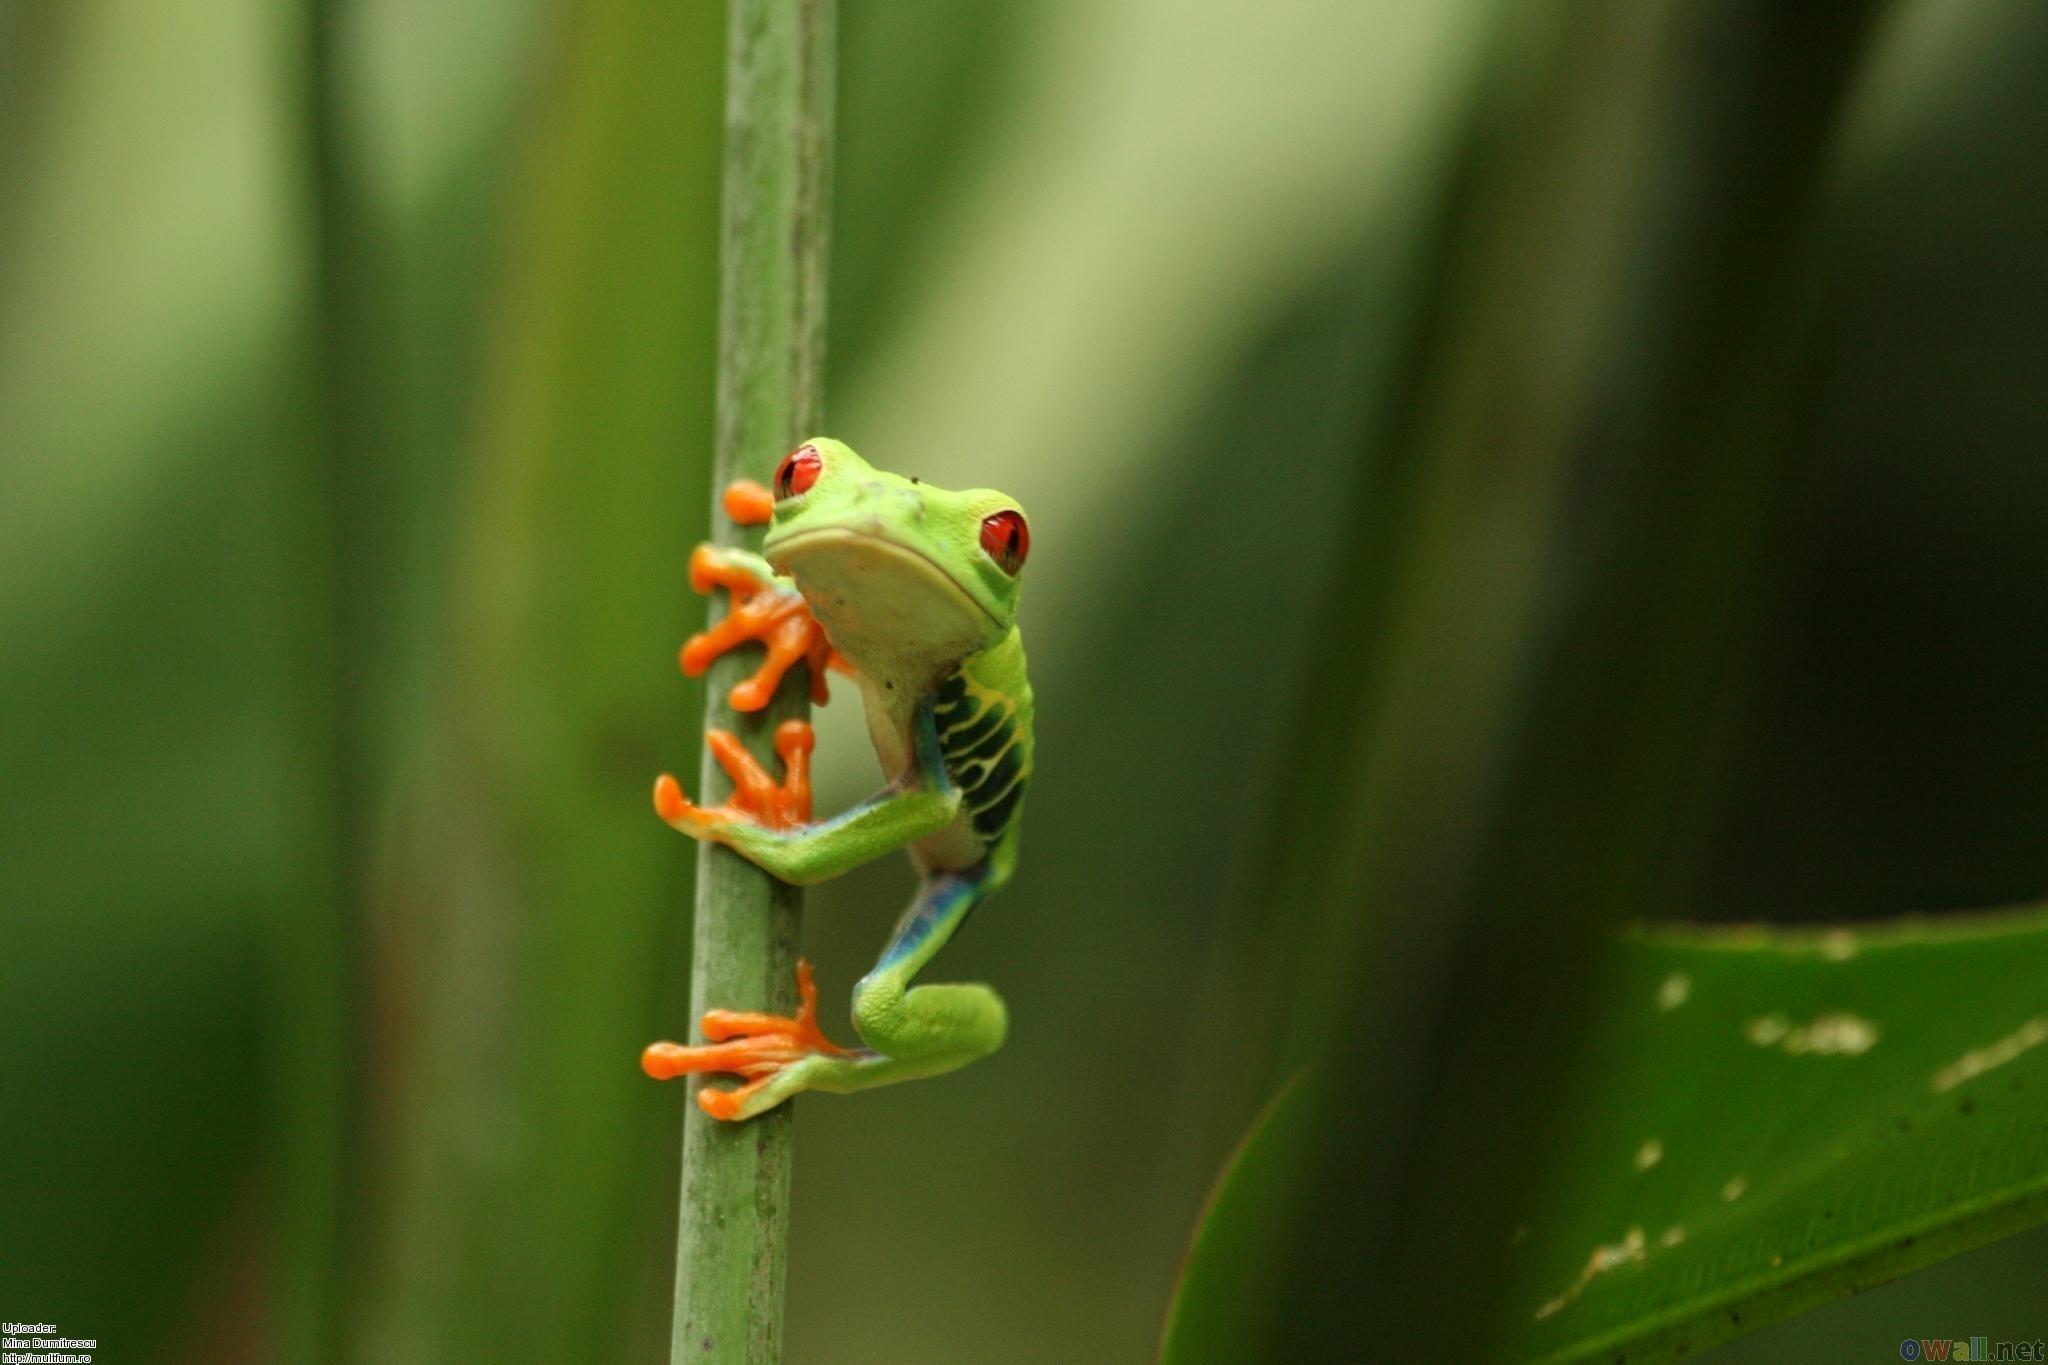 HD Frog Wallpaper 2048×1365 Frog Wallpaper (58 Wallpapers) | Adorable  Wallpapers